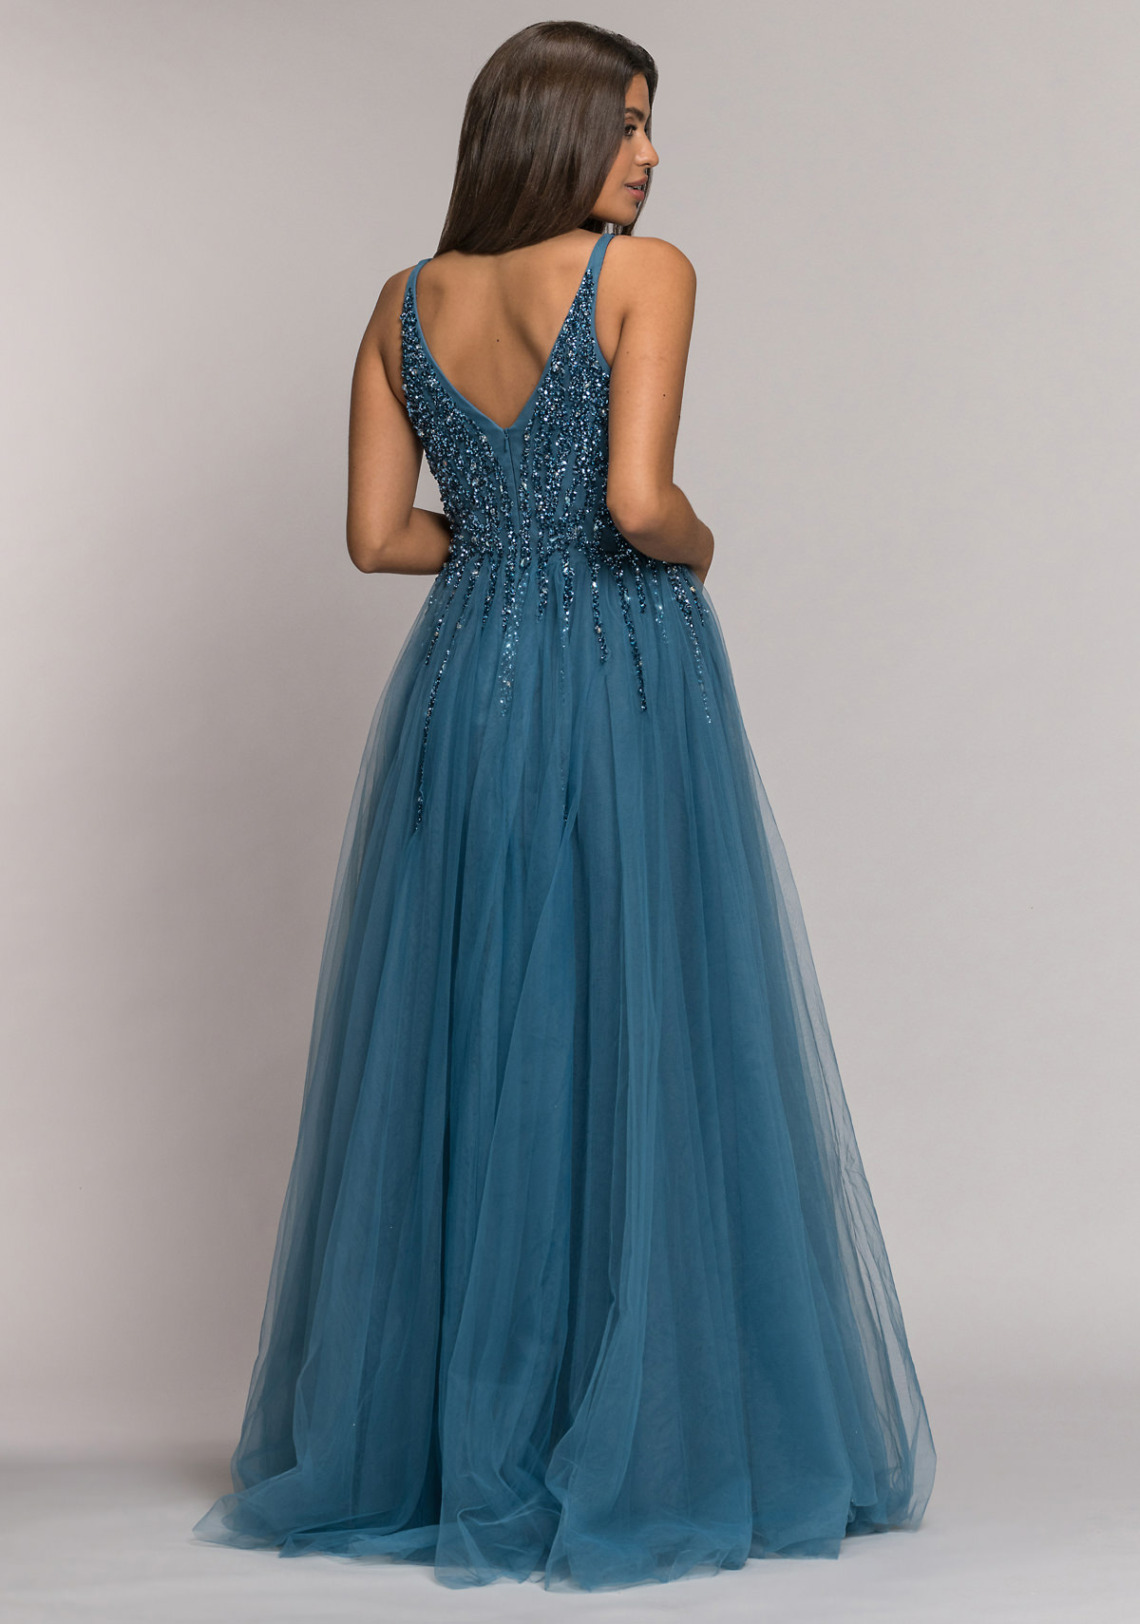 Abiball Abendkleider Ballkleider lang schön ausgefallen V Ausschnitt glitzer jung Tüll Rock Koehlert Modell ice blue hinten